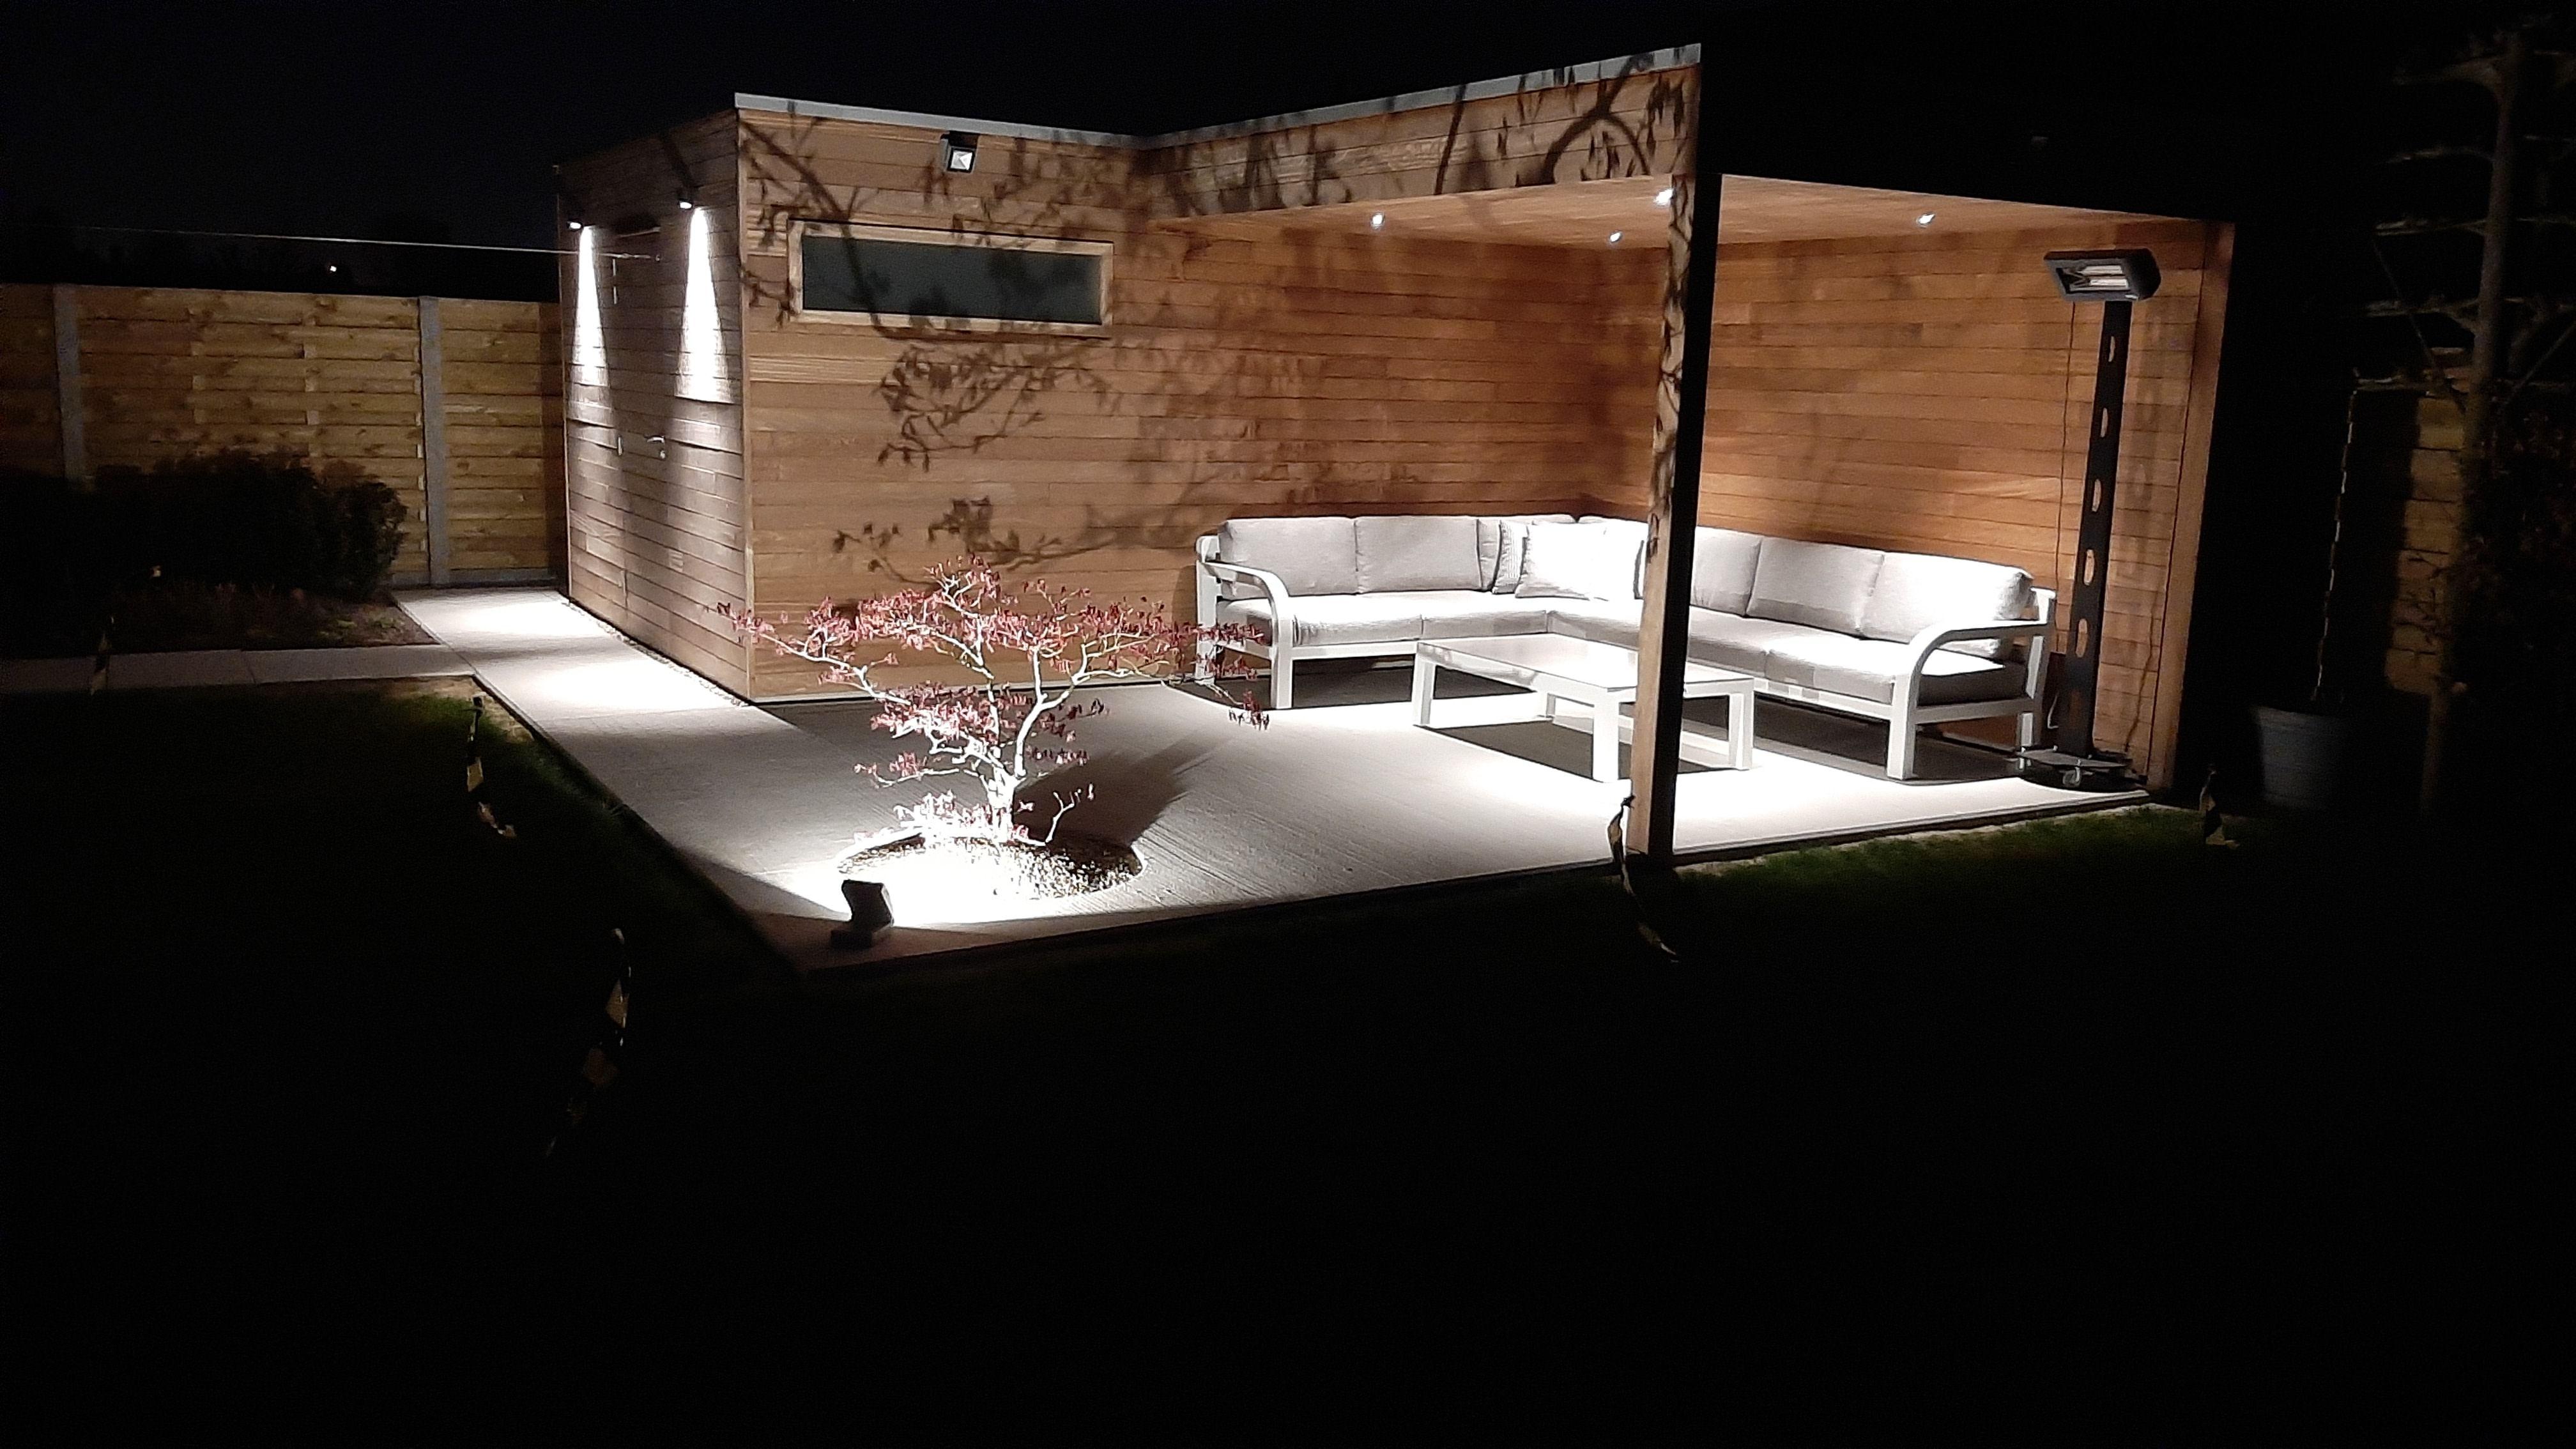 Abri de jardin Cube en iroko avec avancée et abri de stockage